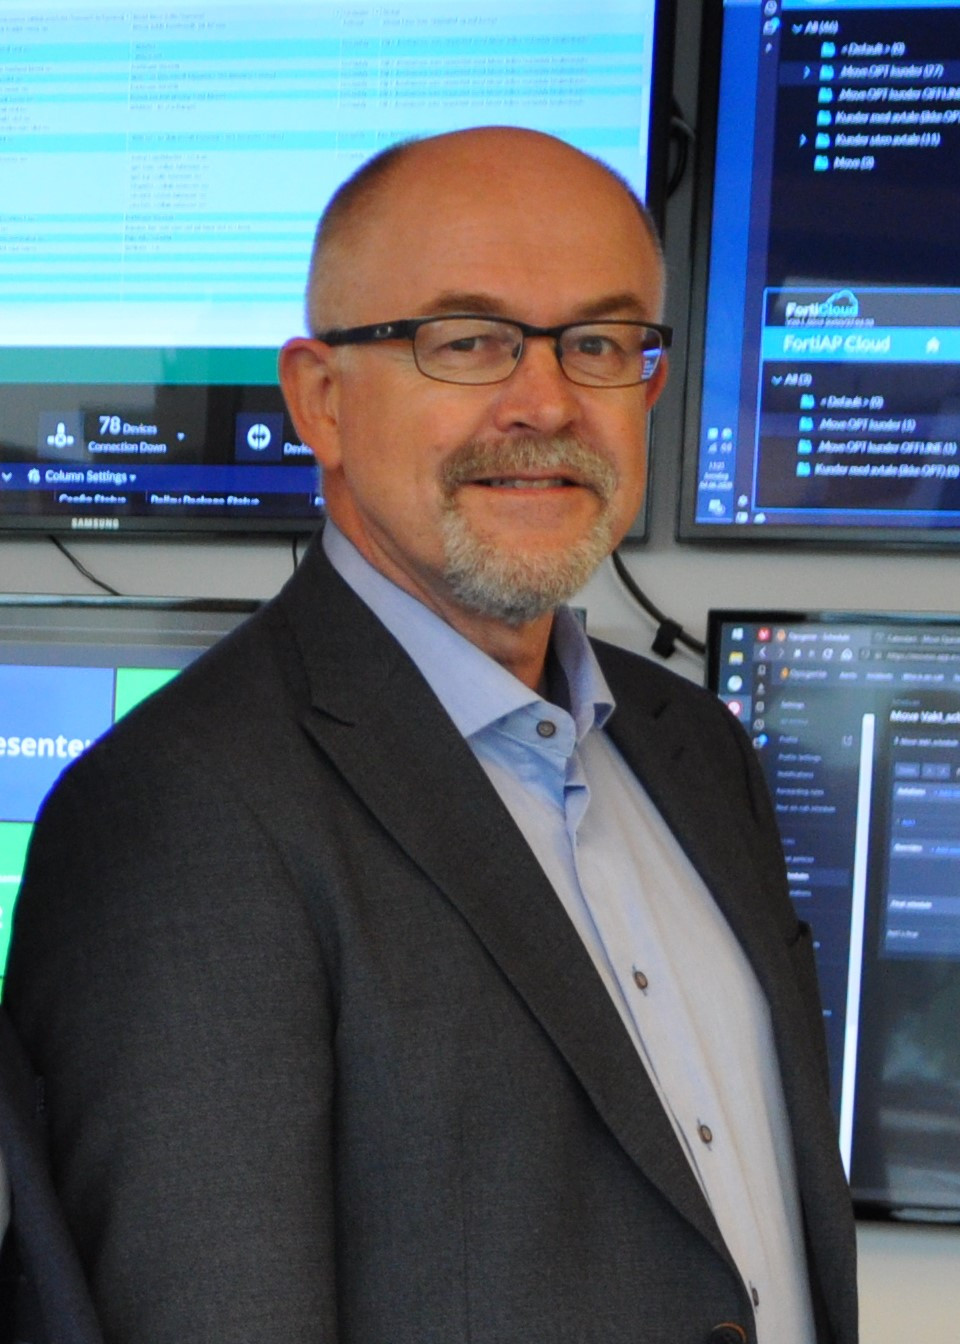 Bjørn Uddal og konsulentteamet i Move bygger bredere og dypere kompetanse på Microsoft teknologier.